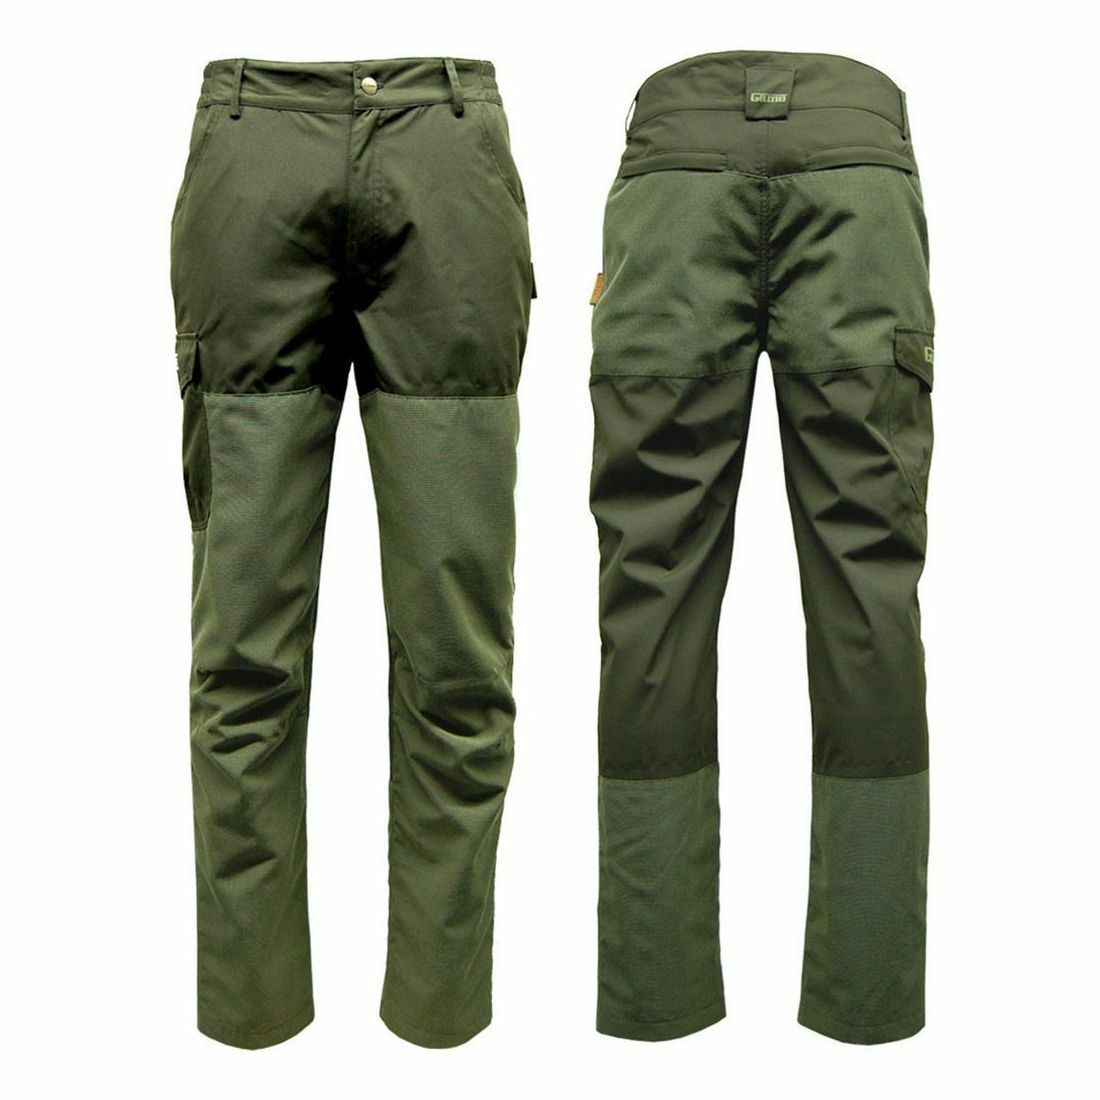 Game Excel Ripstop Waterproof Trousers in Khaki Green